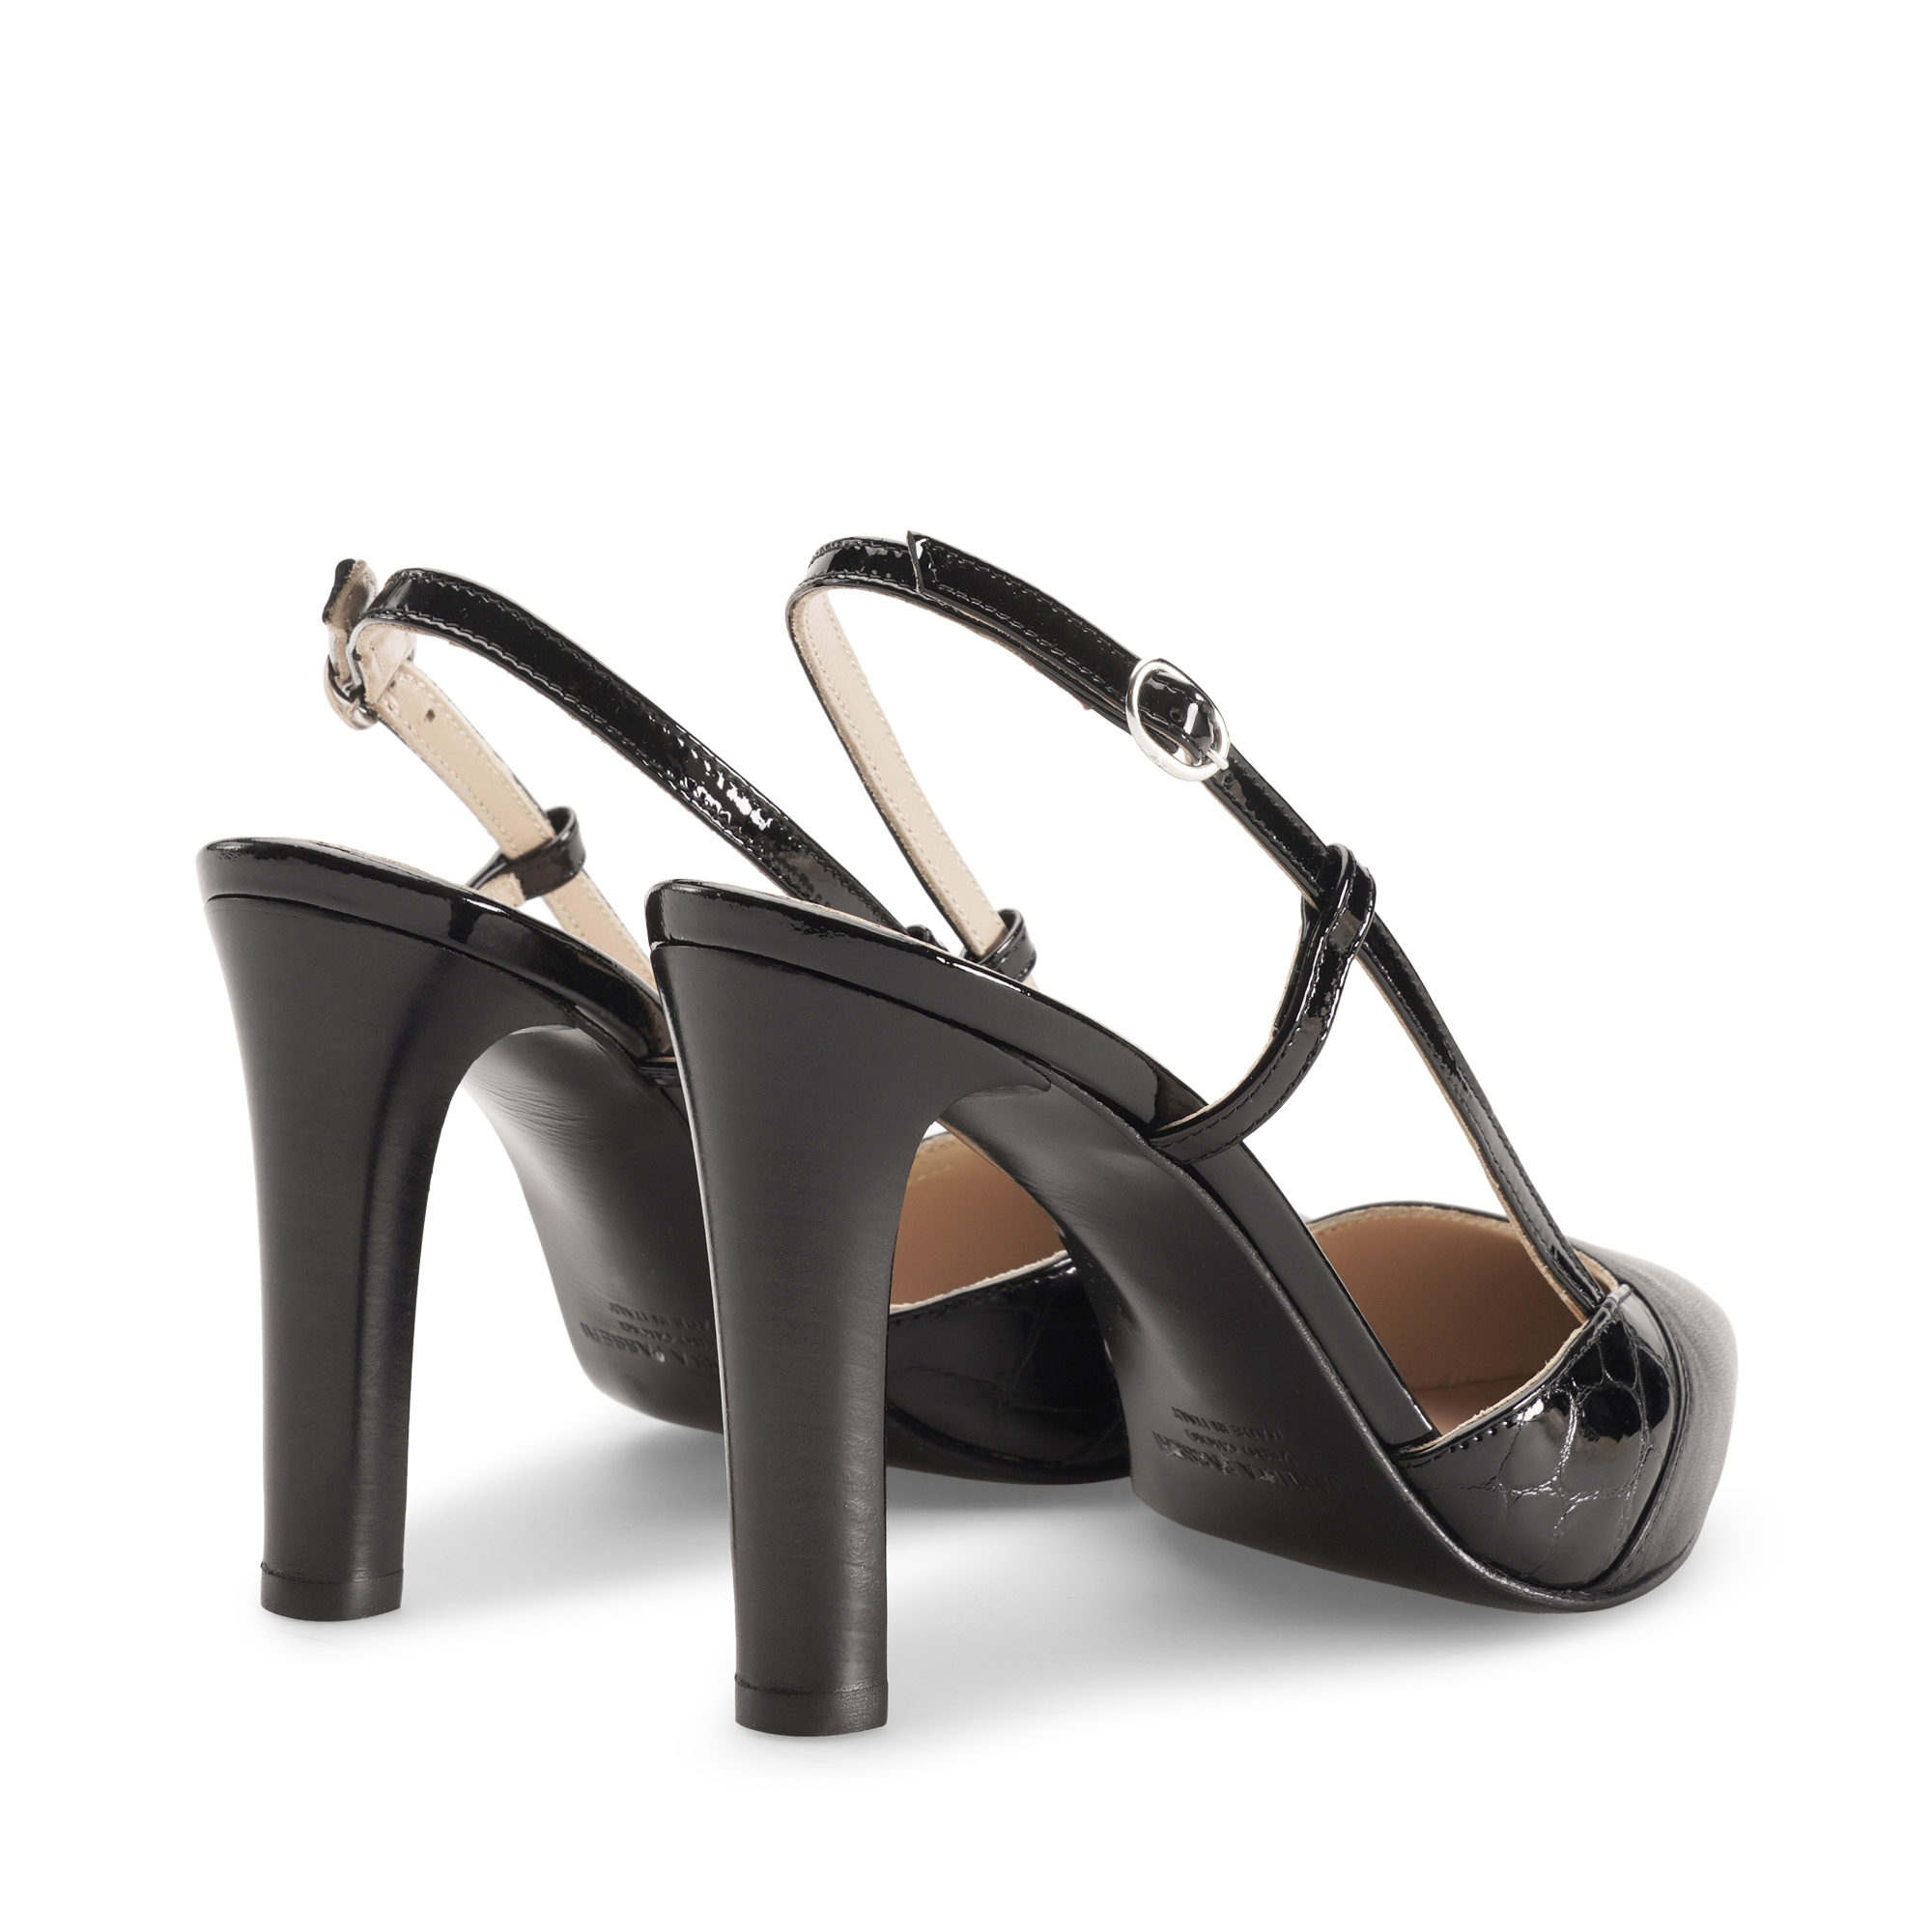 slingback-black-vernice-pelle-emanuela-passeri-heels-shoes-spring-summer-2021